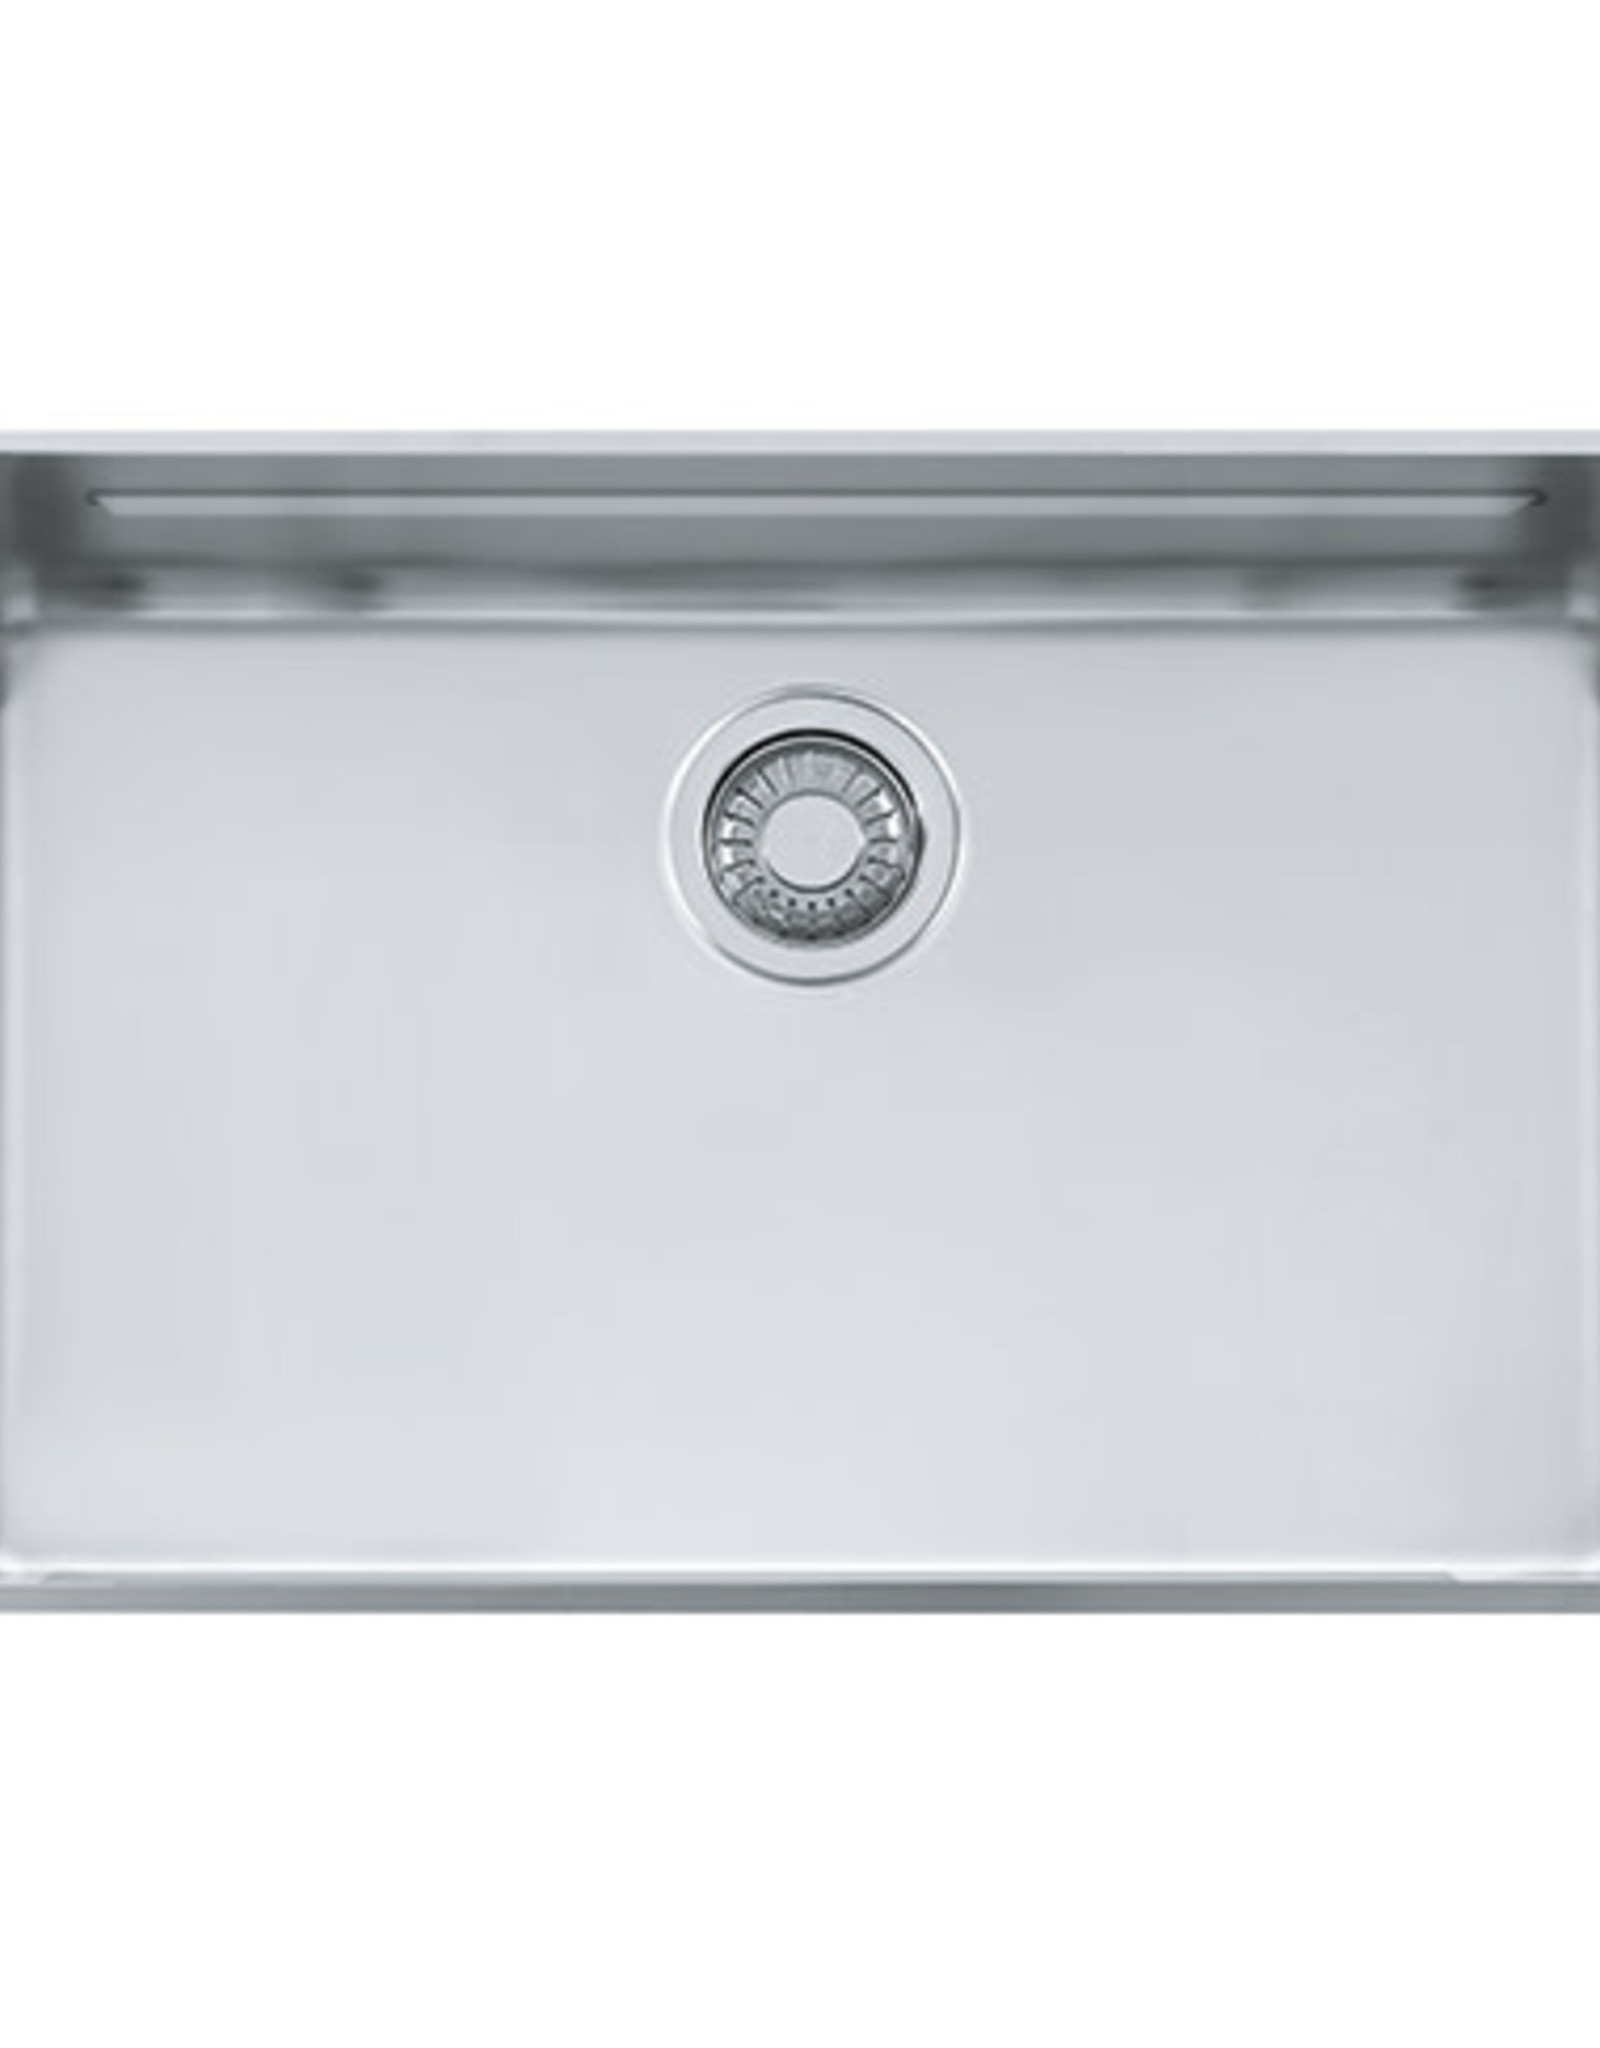 Franke Franke Kubus KBX110-28 Stainless Steel Undermount Kitchen Sink